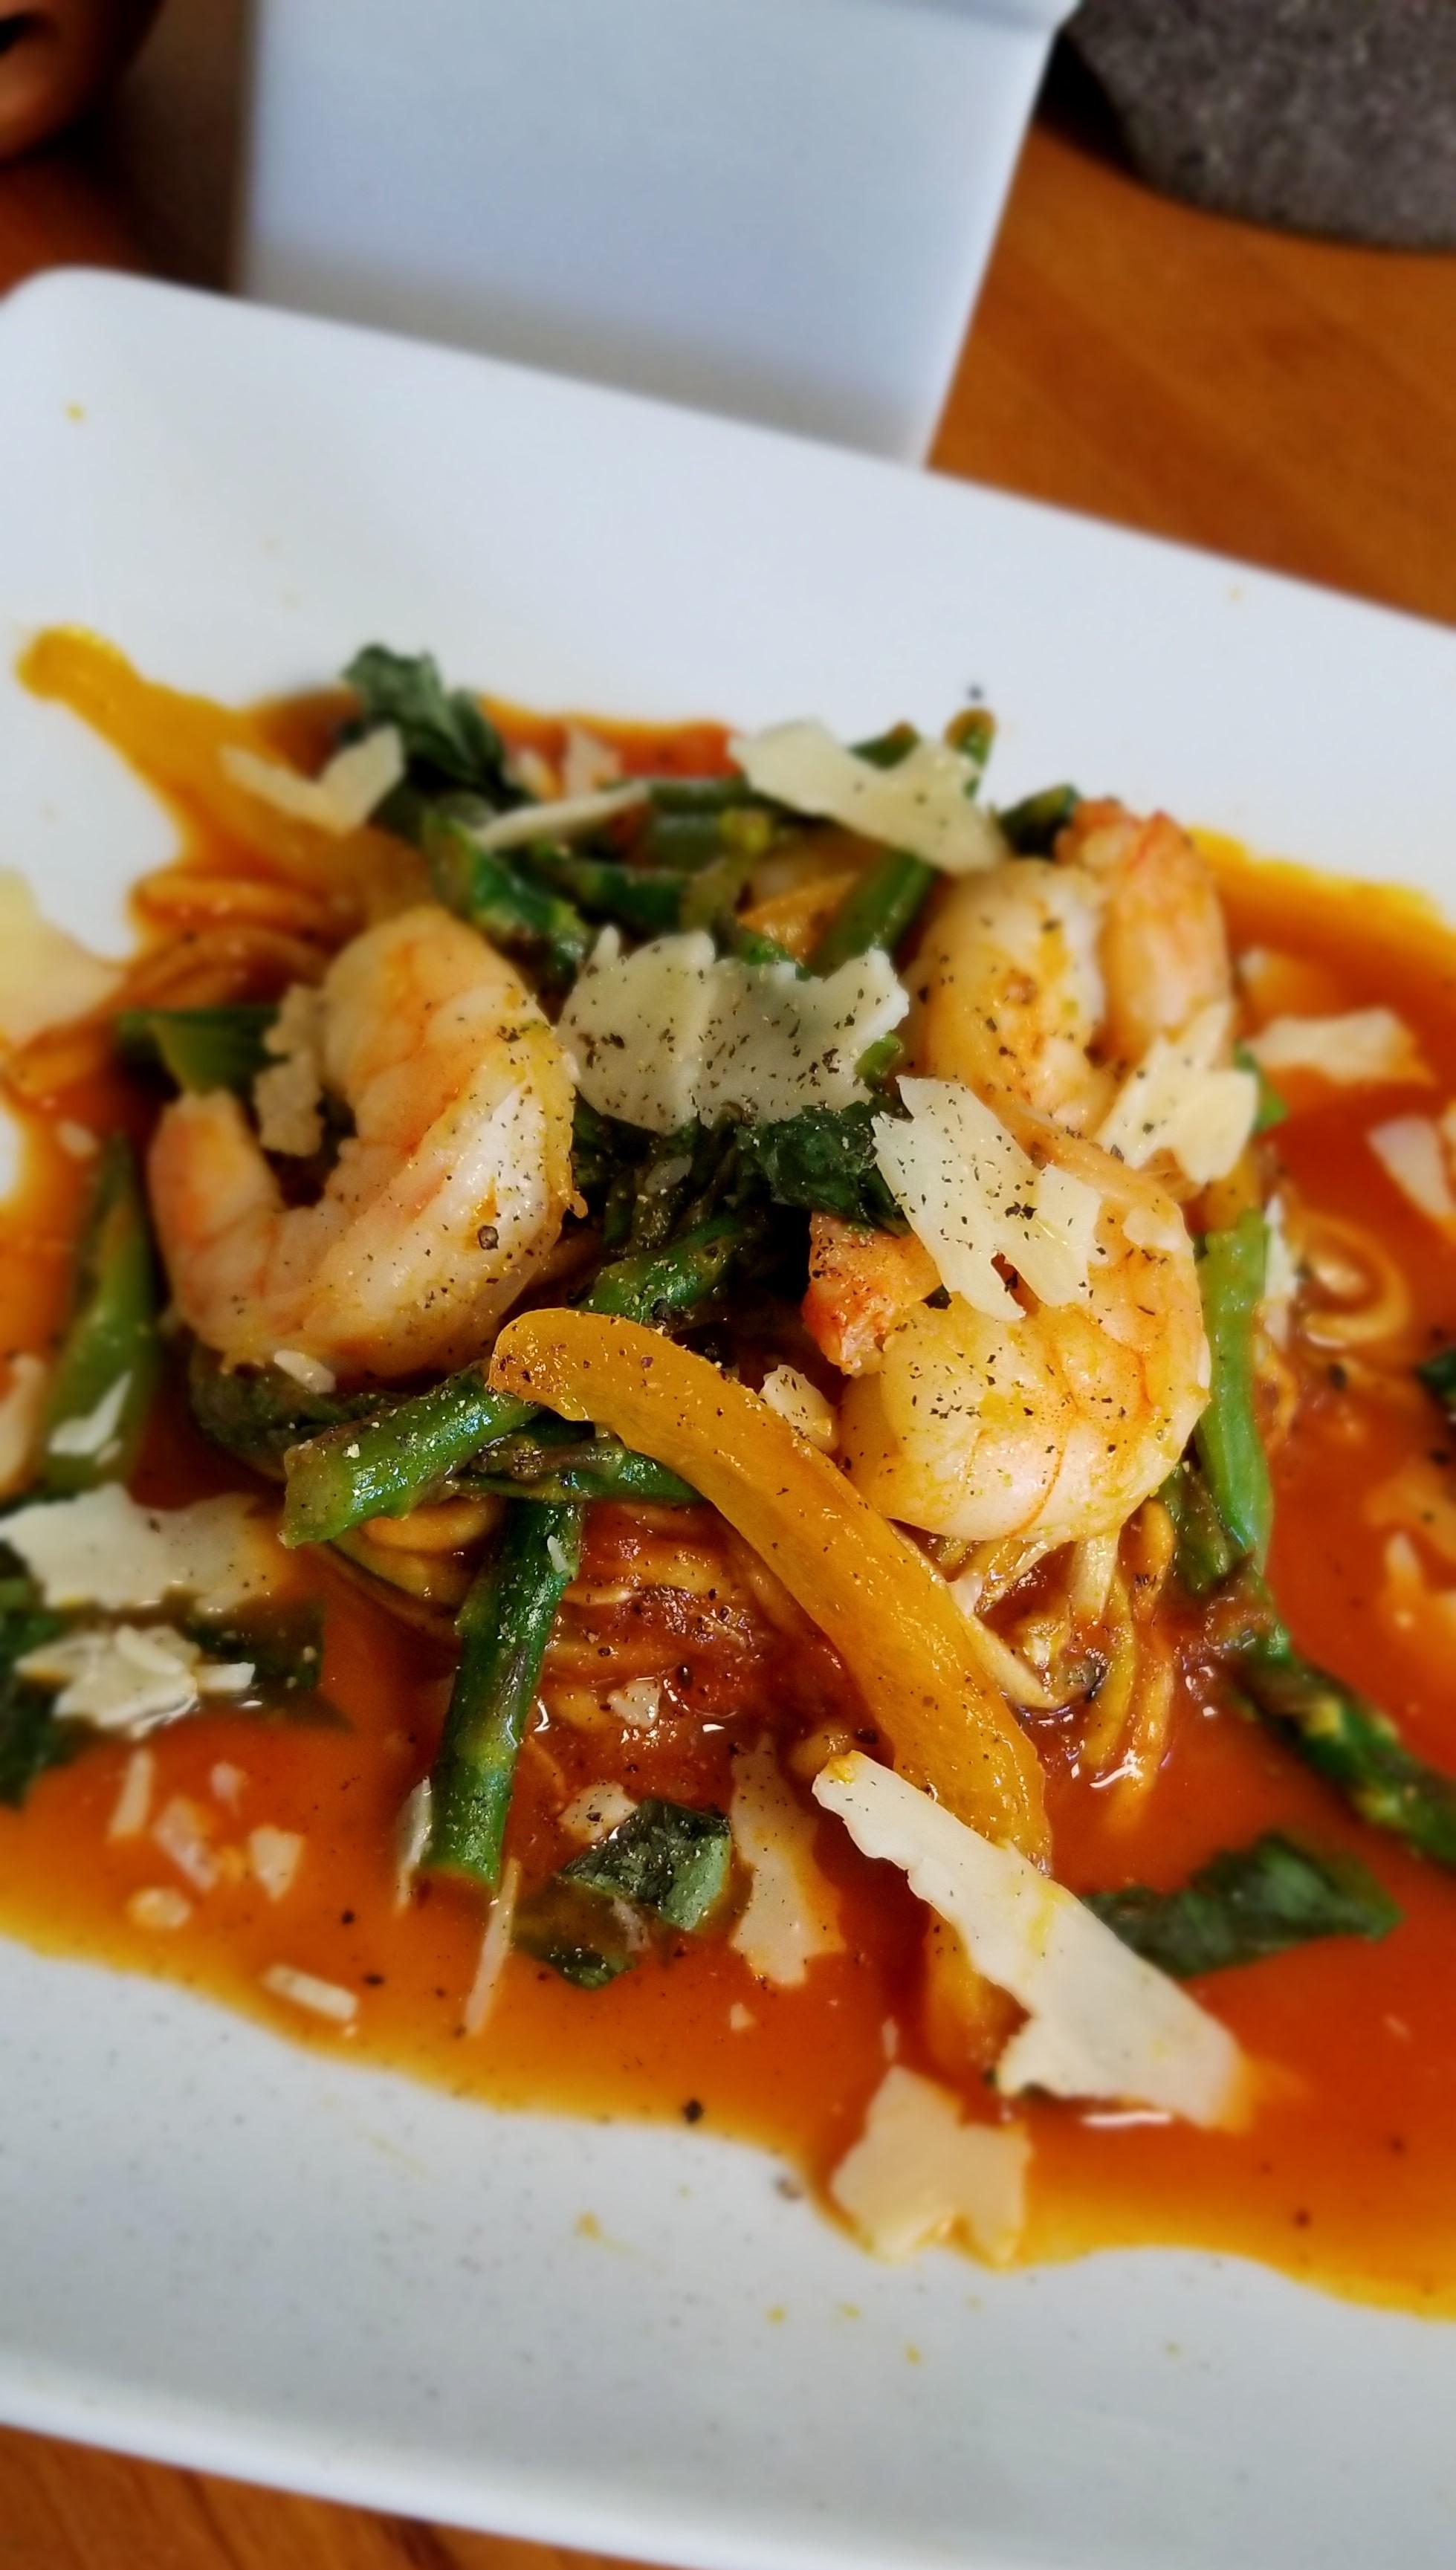 Tomato Shrimp with Zucchini Noodles